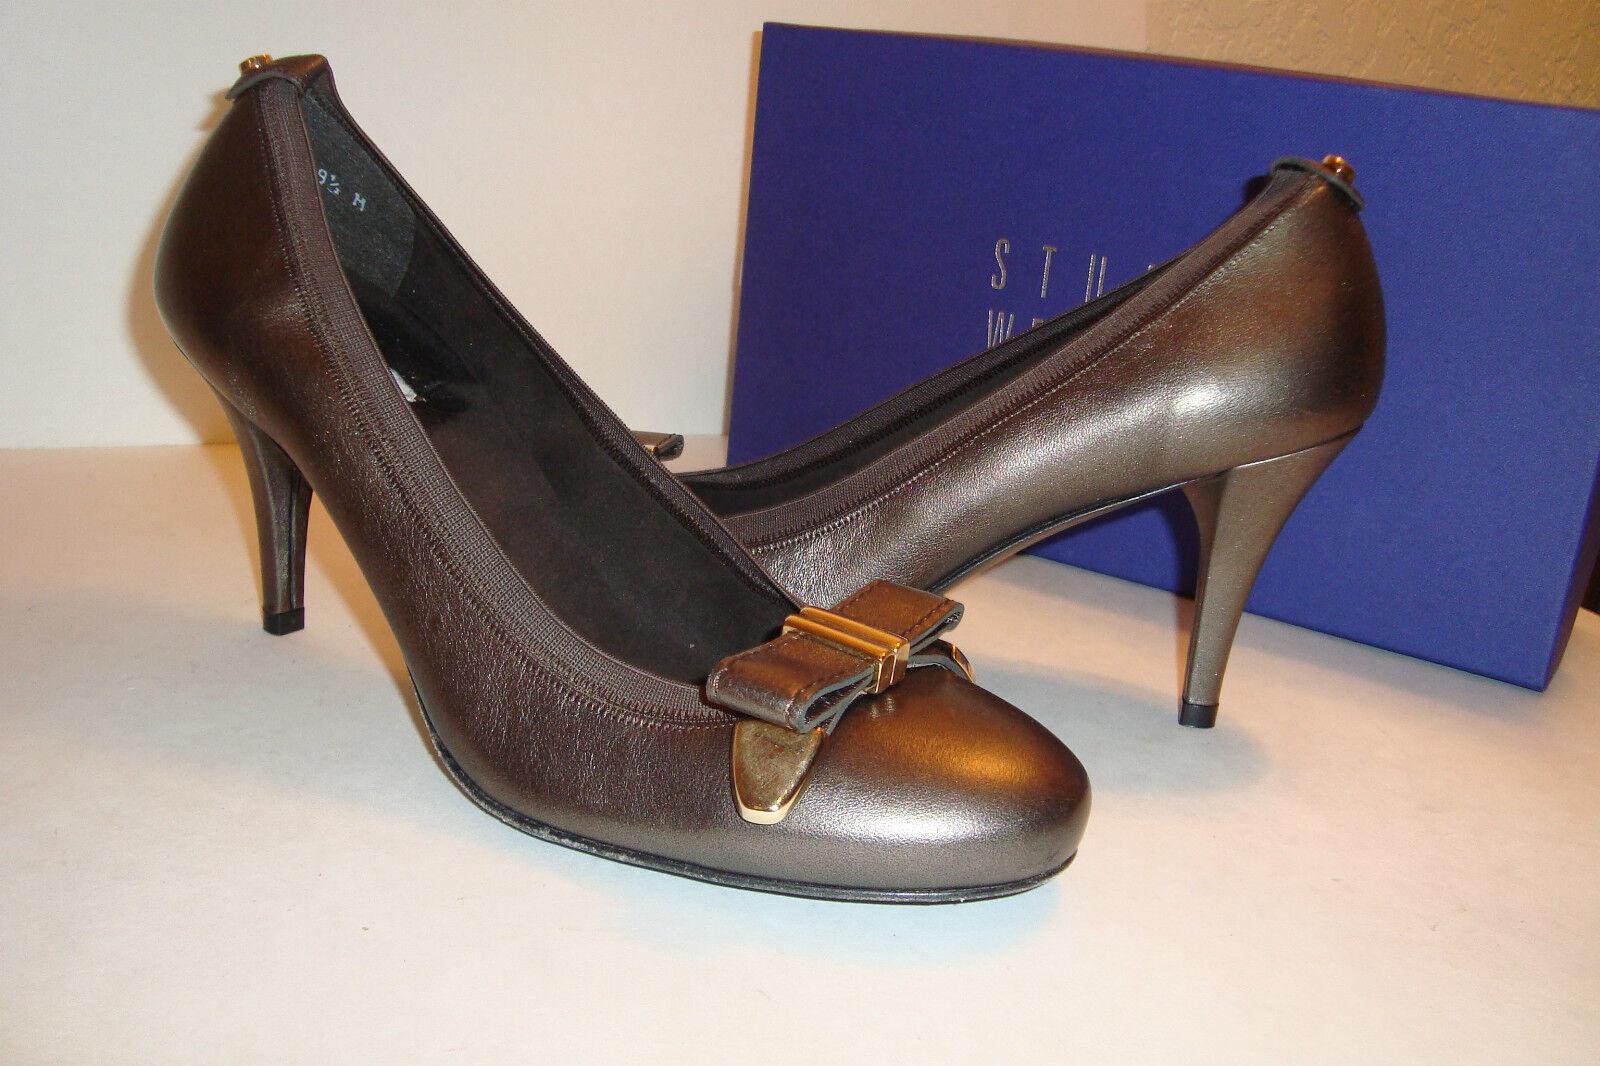 Stuart Weitzman Donna Bwana Sepia Mordore Heels Shoes 9.5 MED DISPLAY MODEL